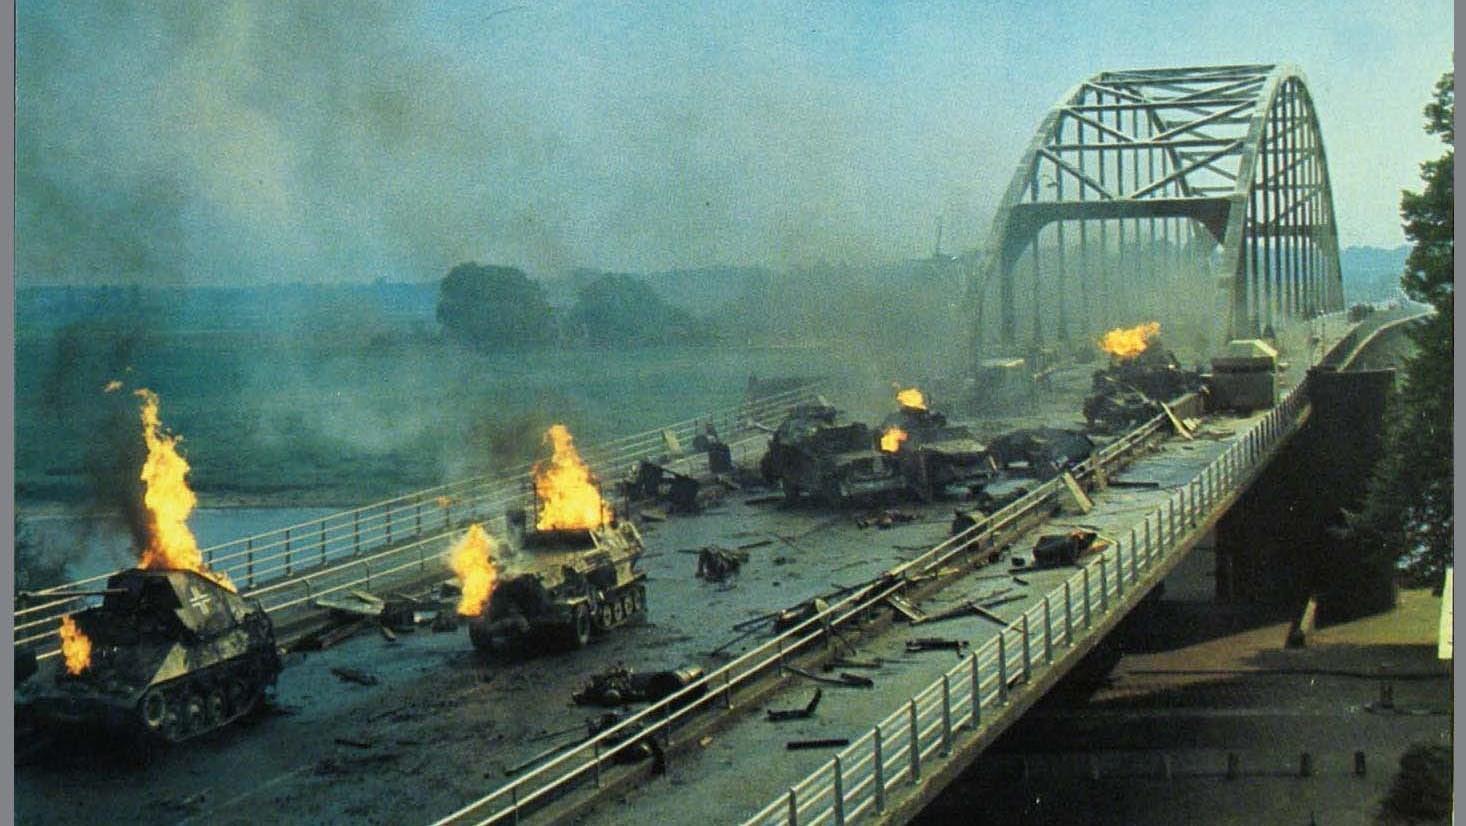 [Obrazek: a-bridge-too-far_527989.jpg]